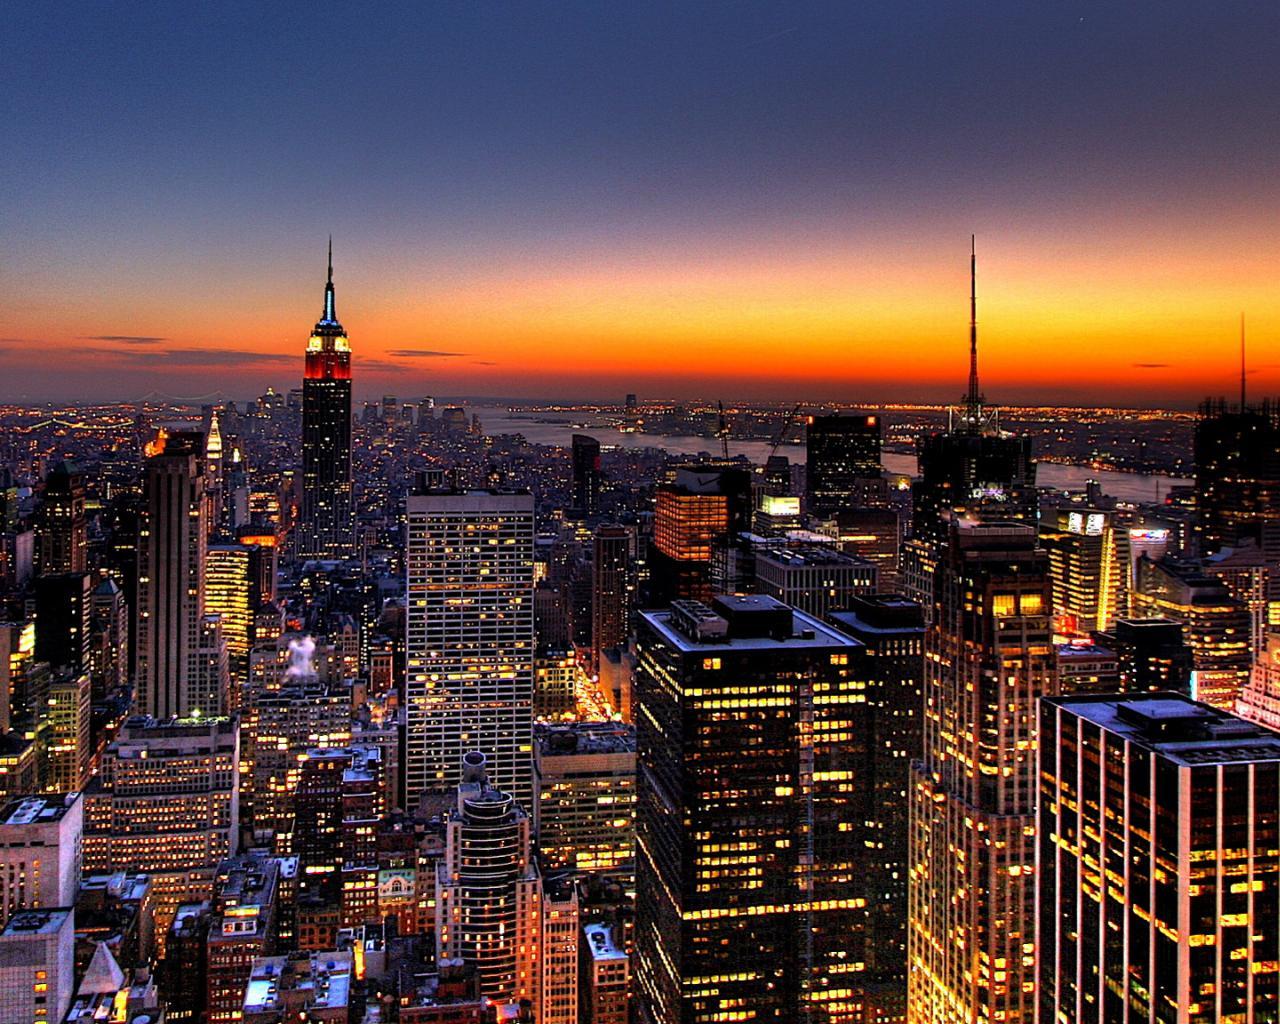 new york city night 2048x1152 need Normal 43 640x480 800x600 1280x1024